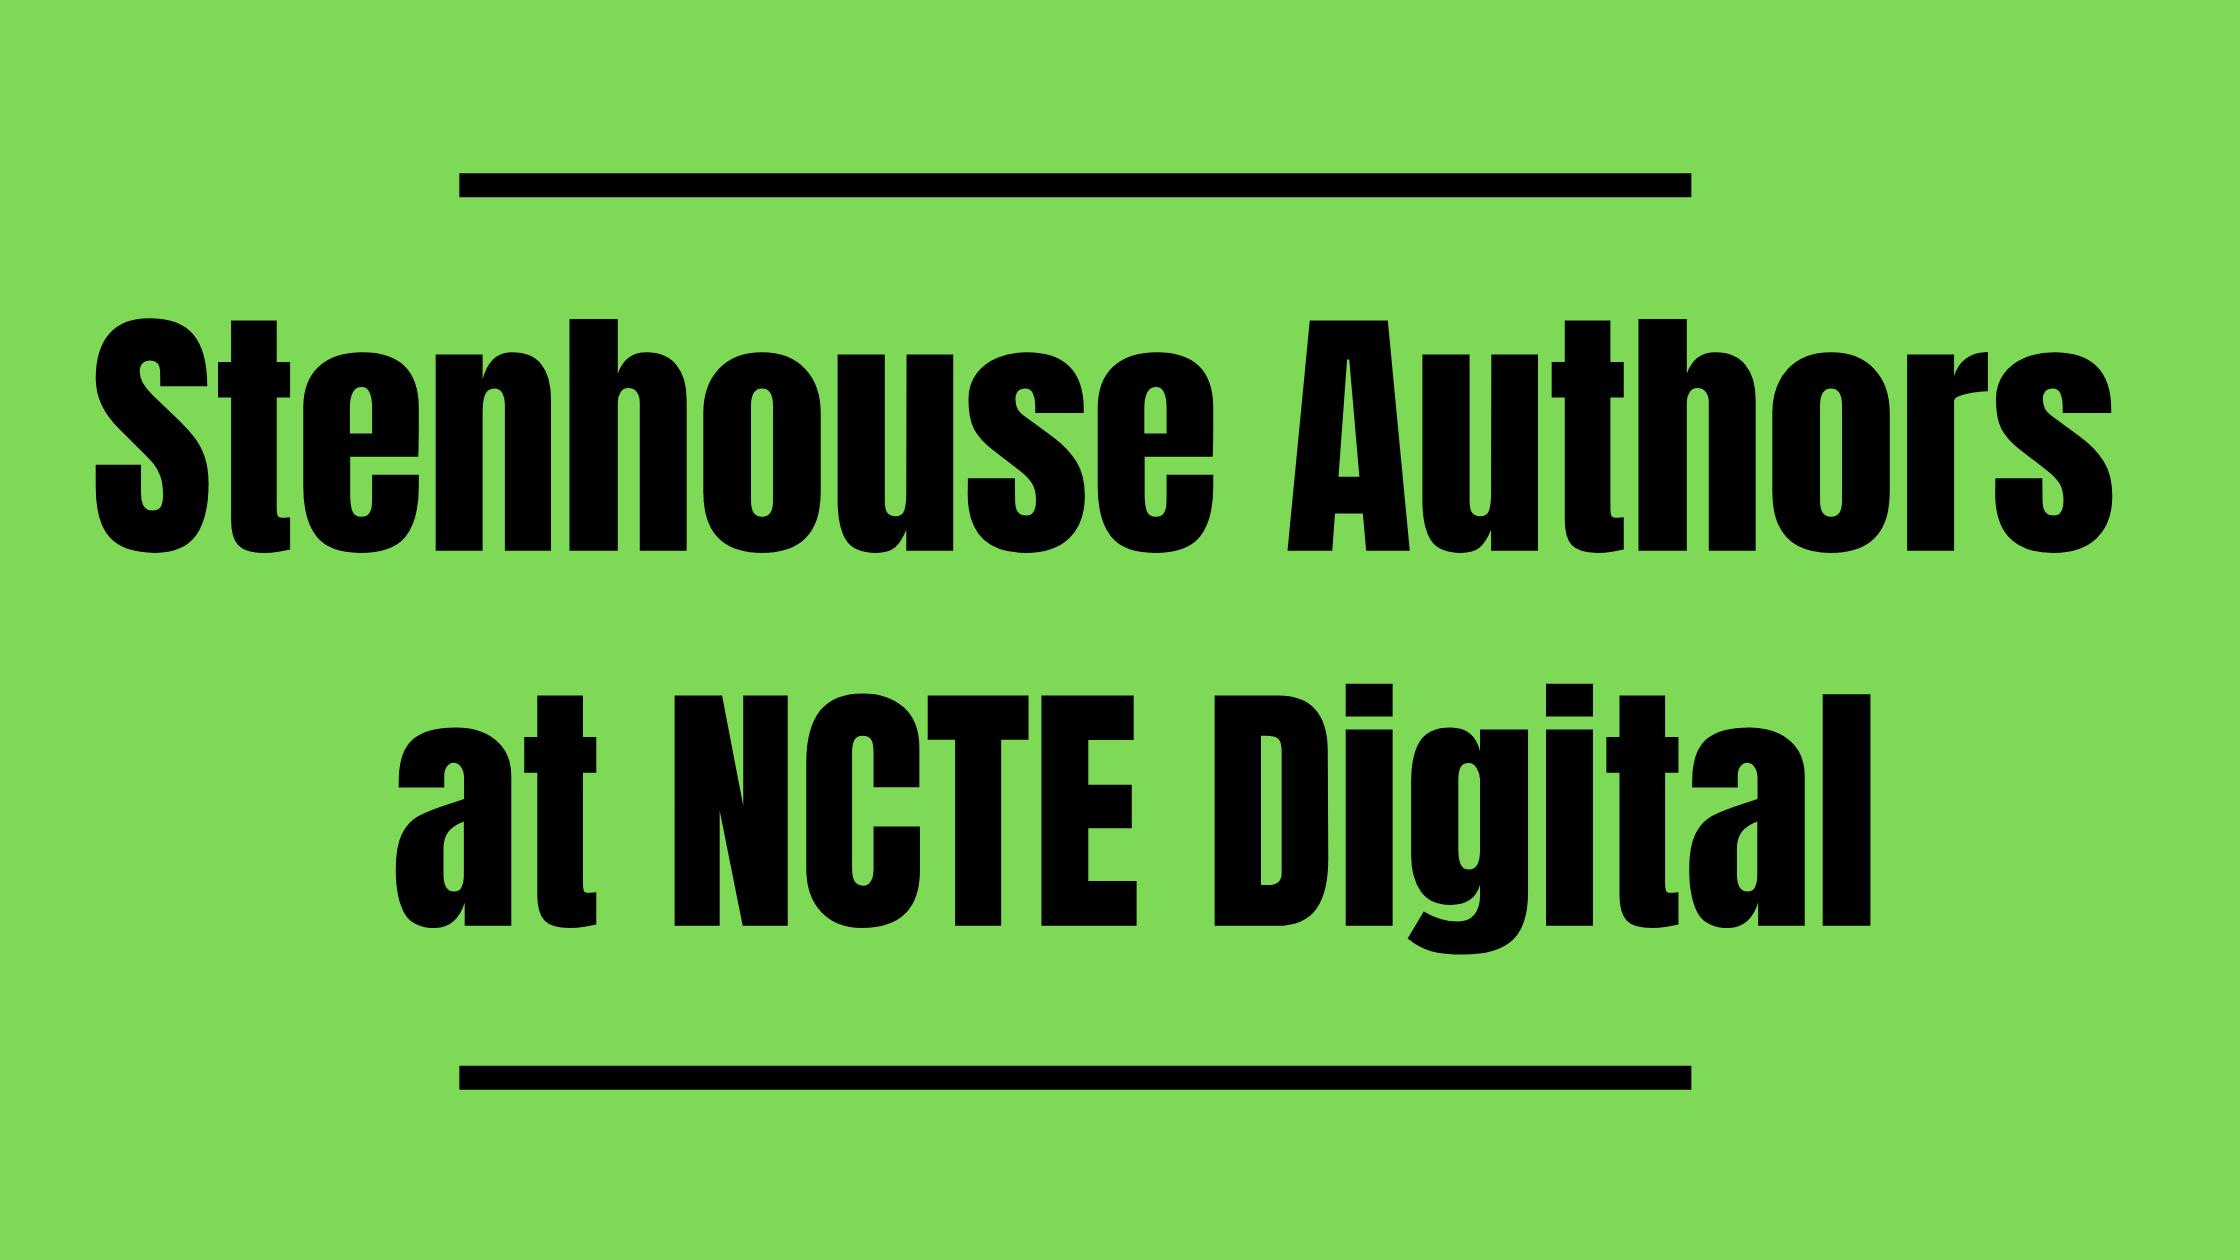 Stenhouse Authors at NCTE Digital